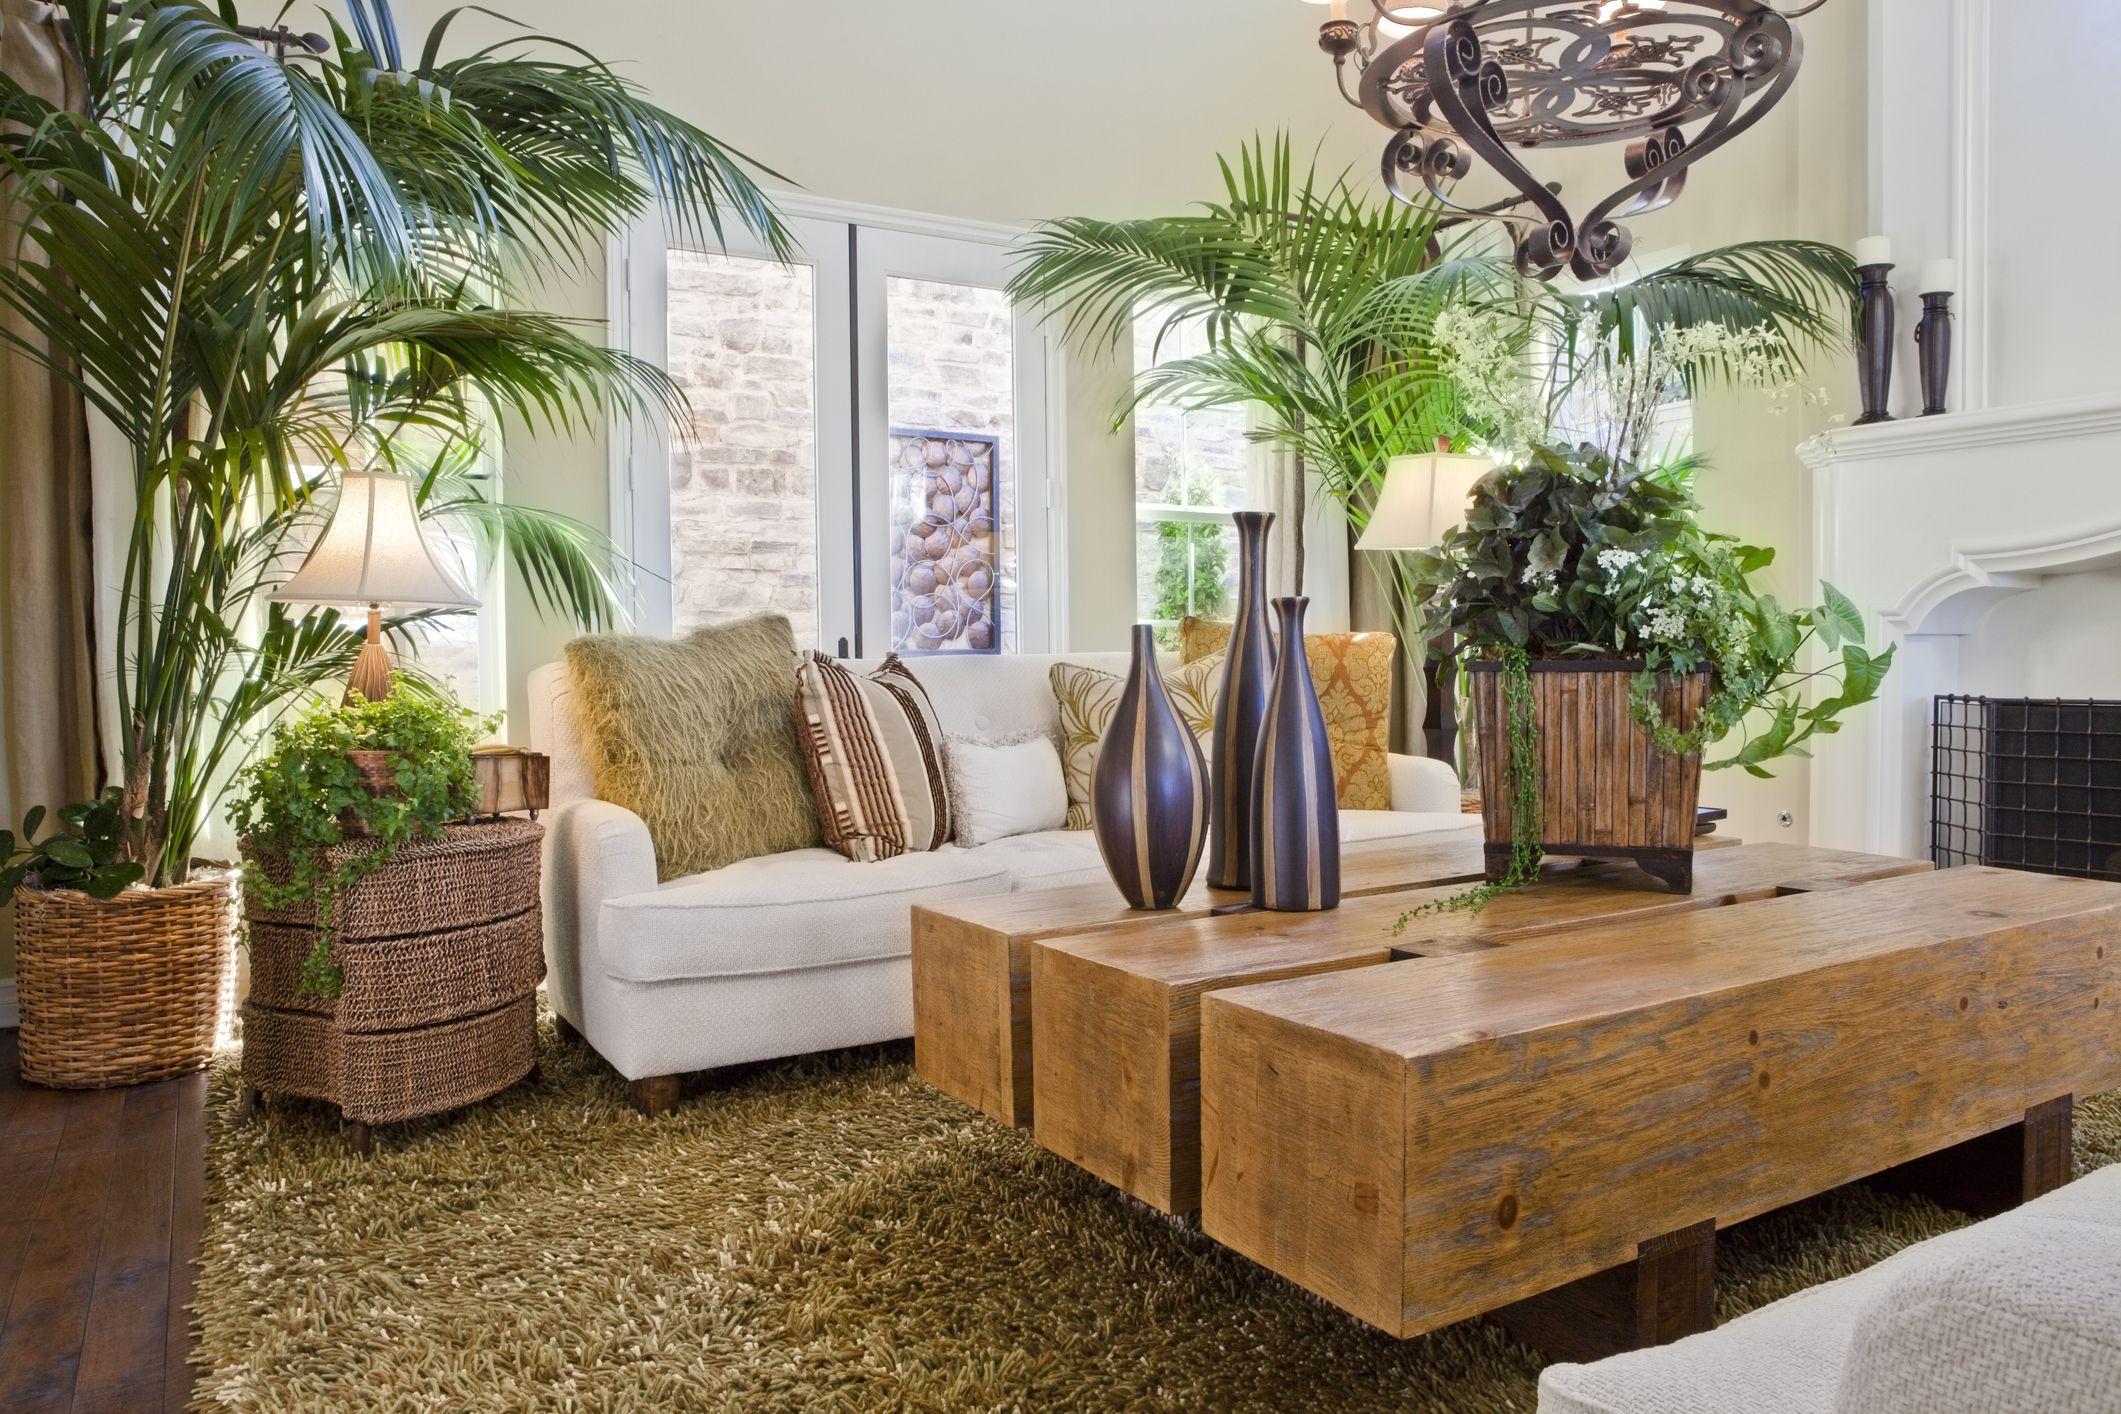 Decora con plantas de interior a partir de ideas DIY de Pinterest